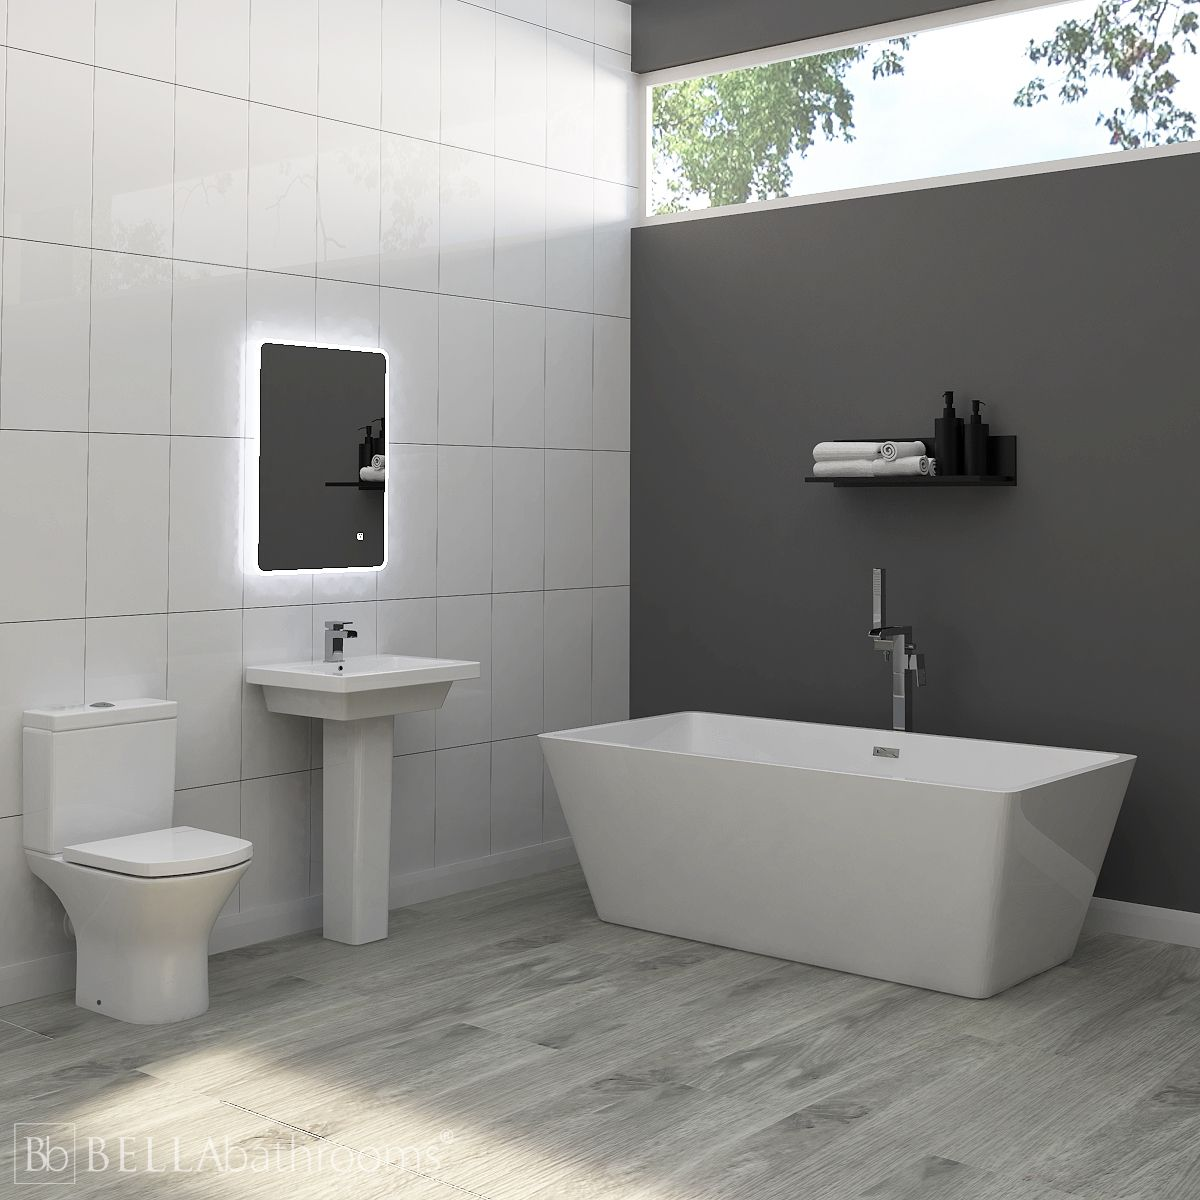 RAK Resort Bathroom Suite with Boston Freestanding Bath